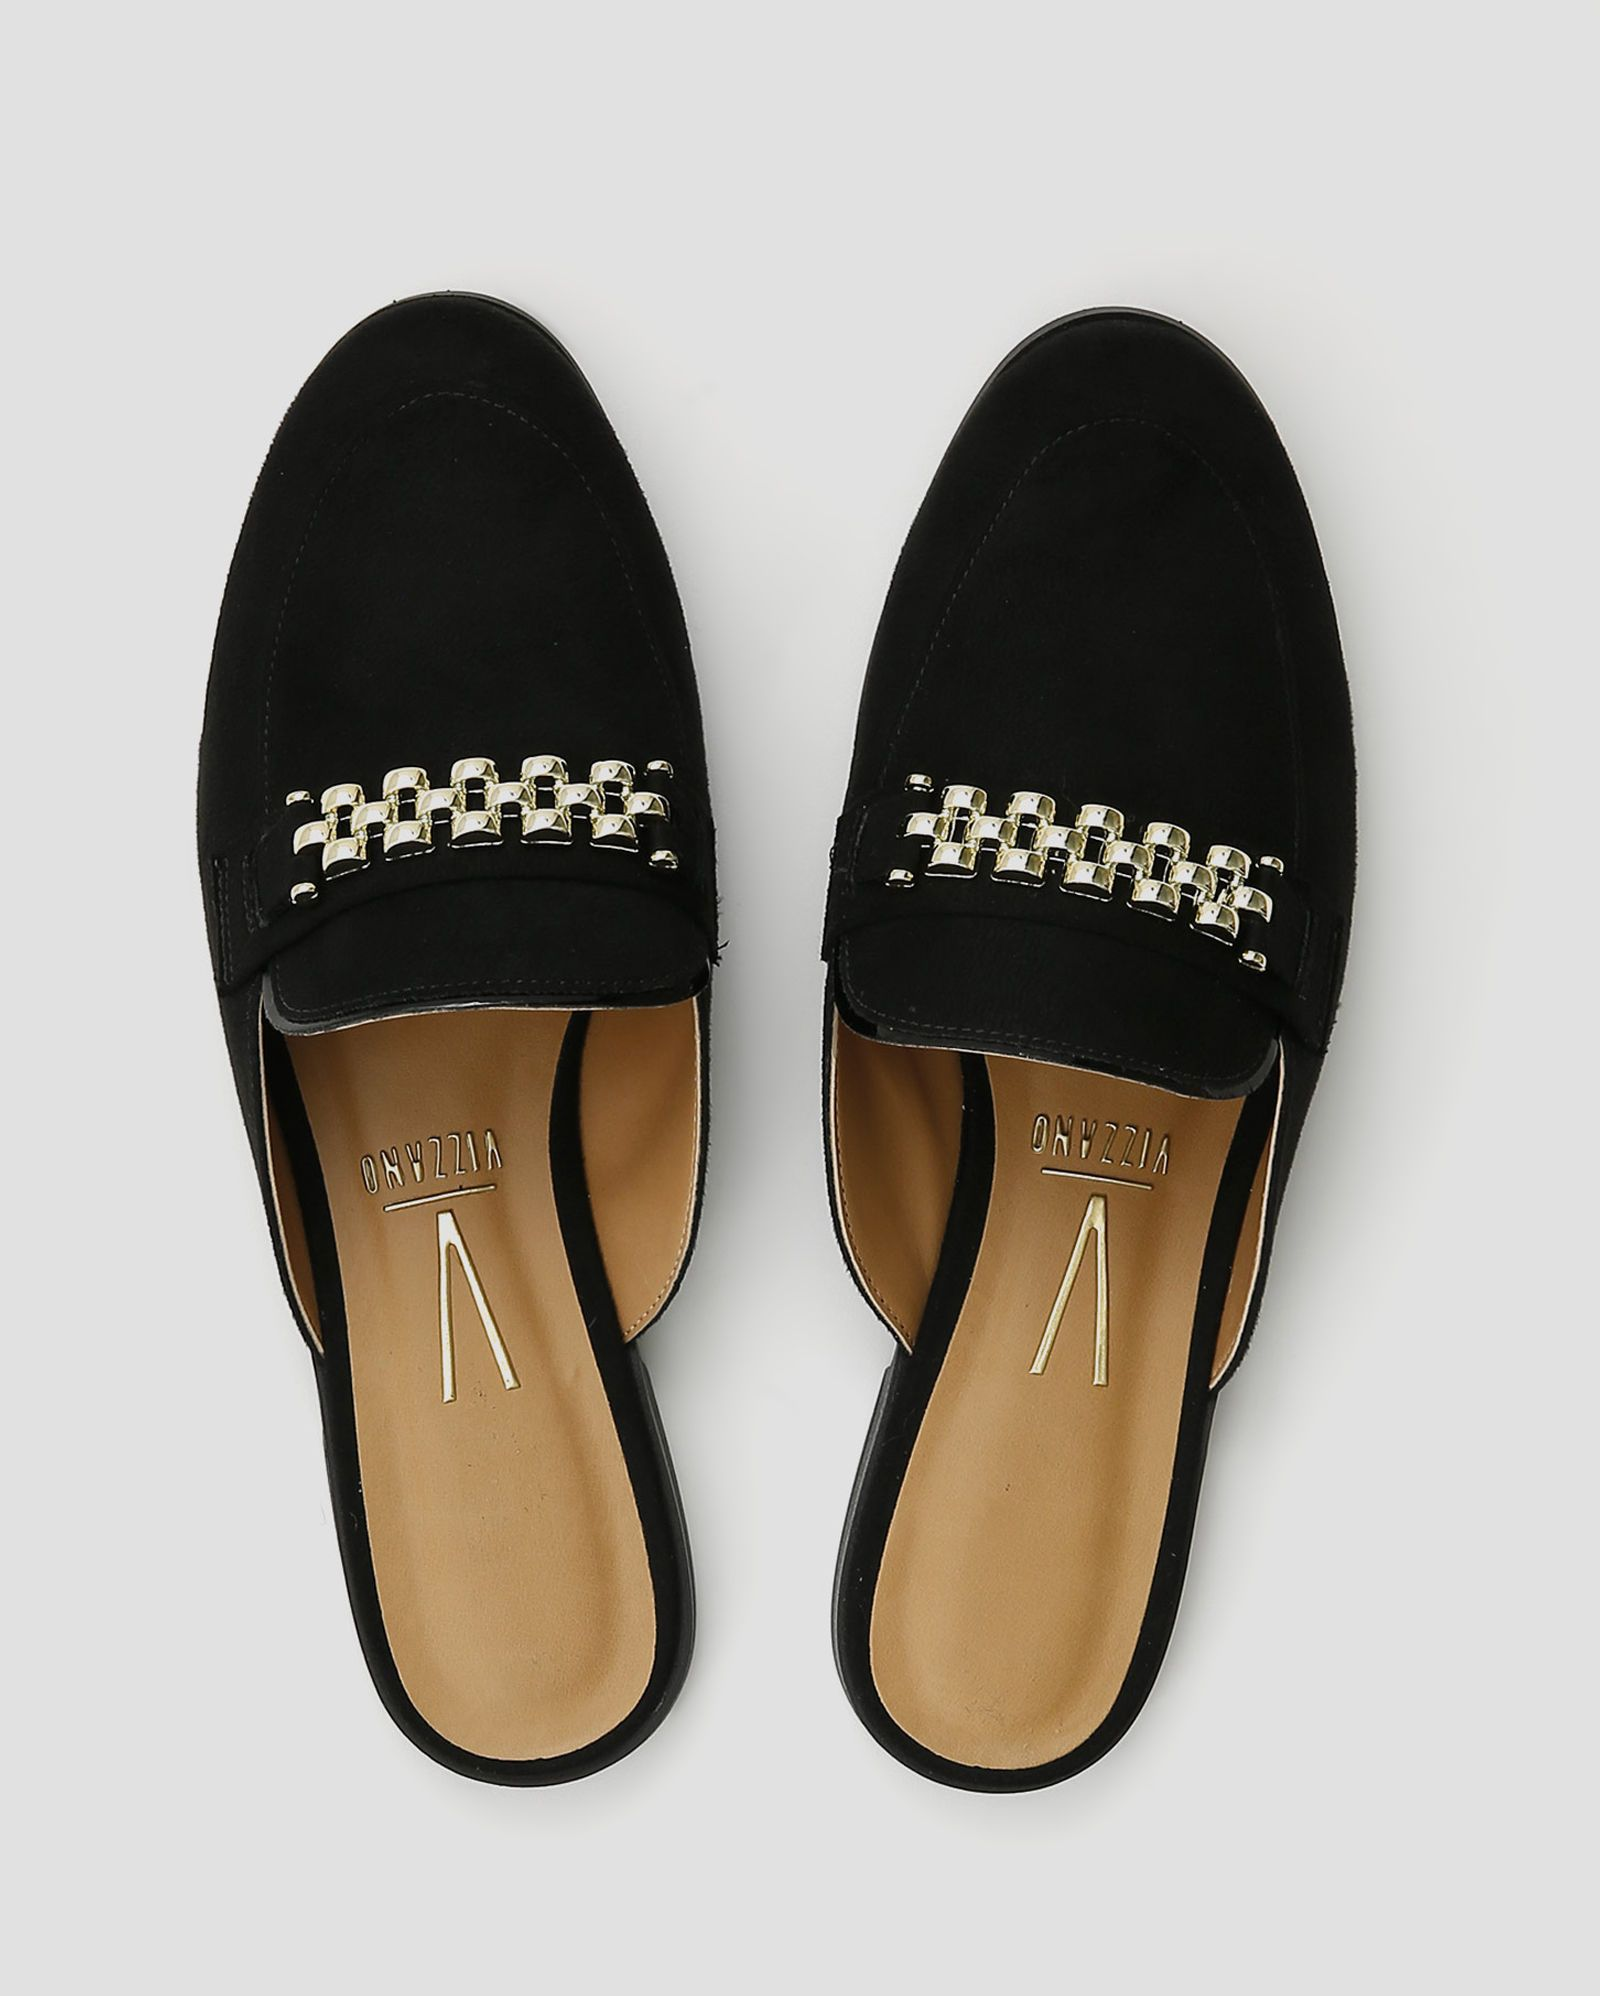 a71b857947 Sapato Mule Vizzano - Tamanco - Calçados Femininos - Calçados Calças  Femininas